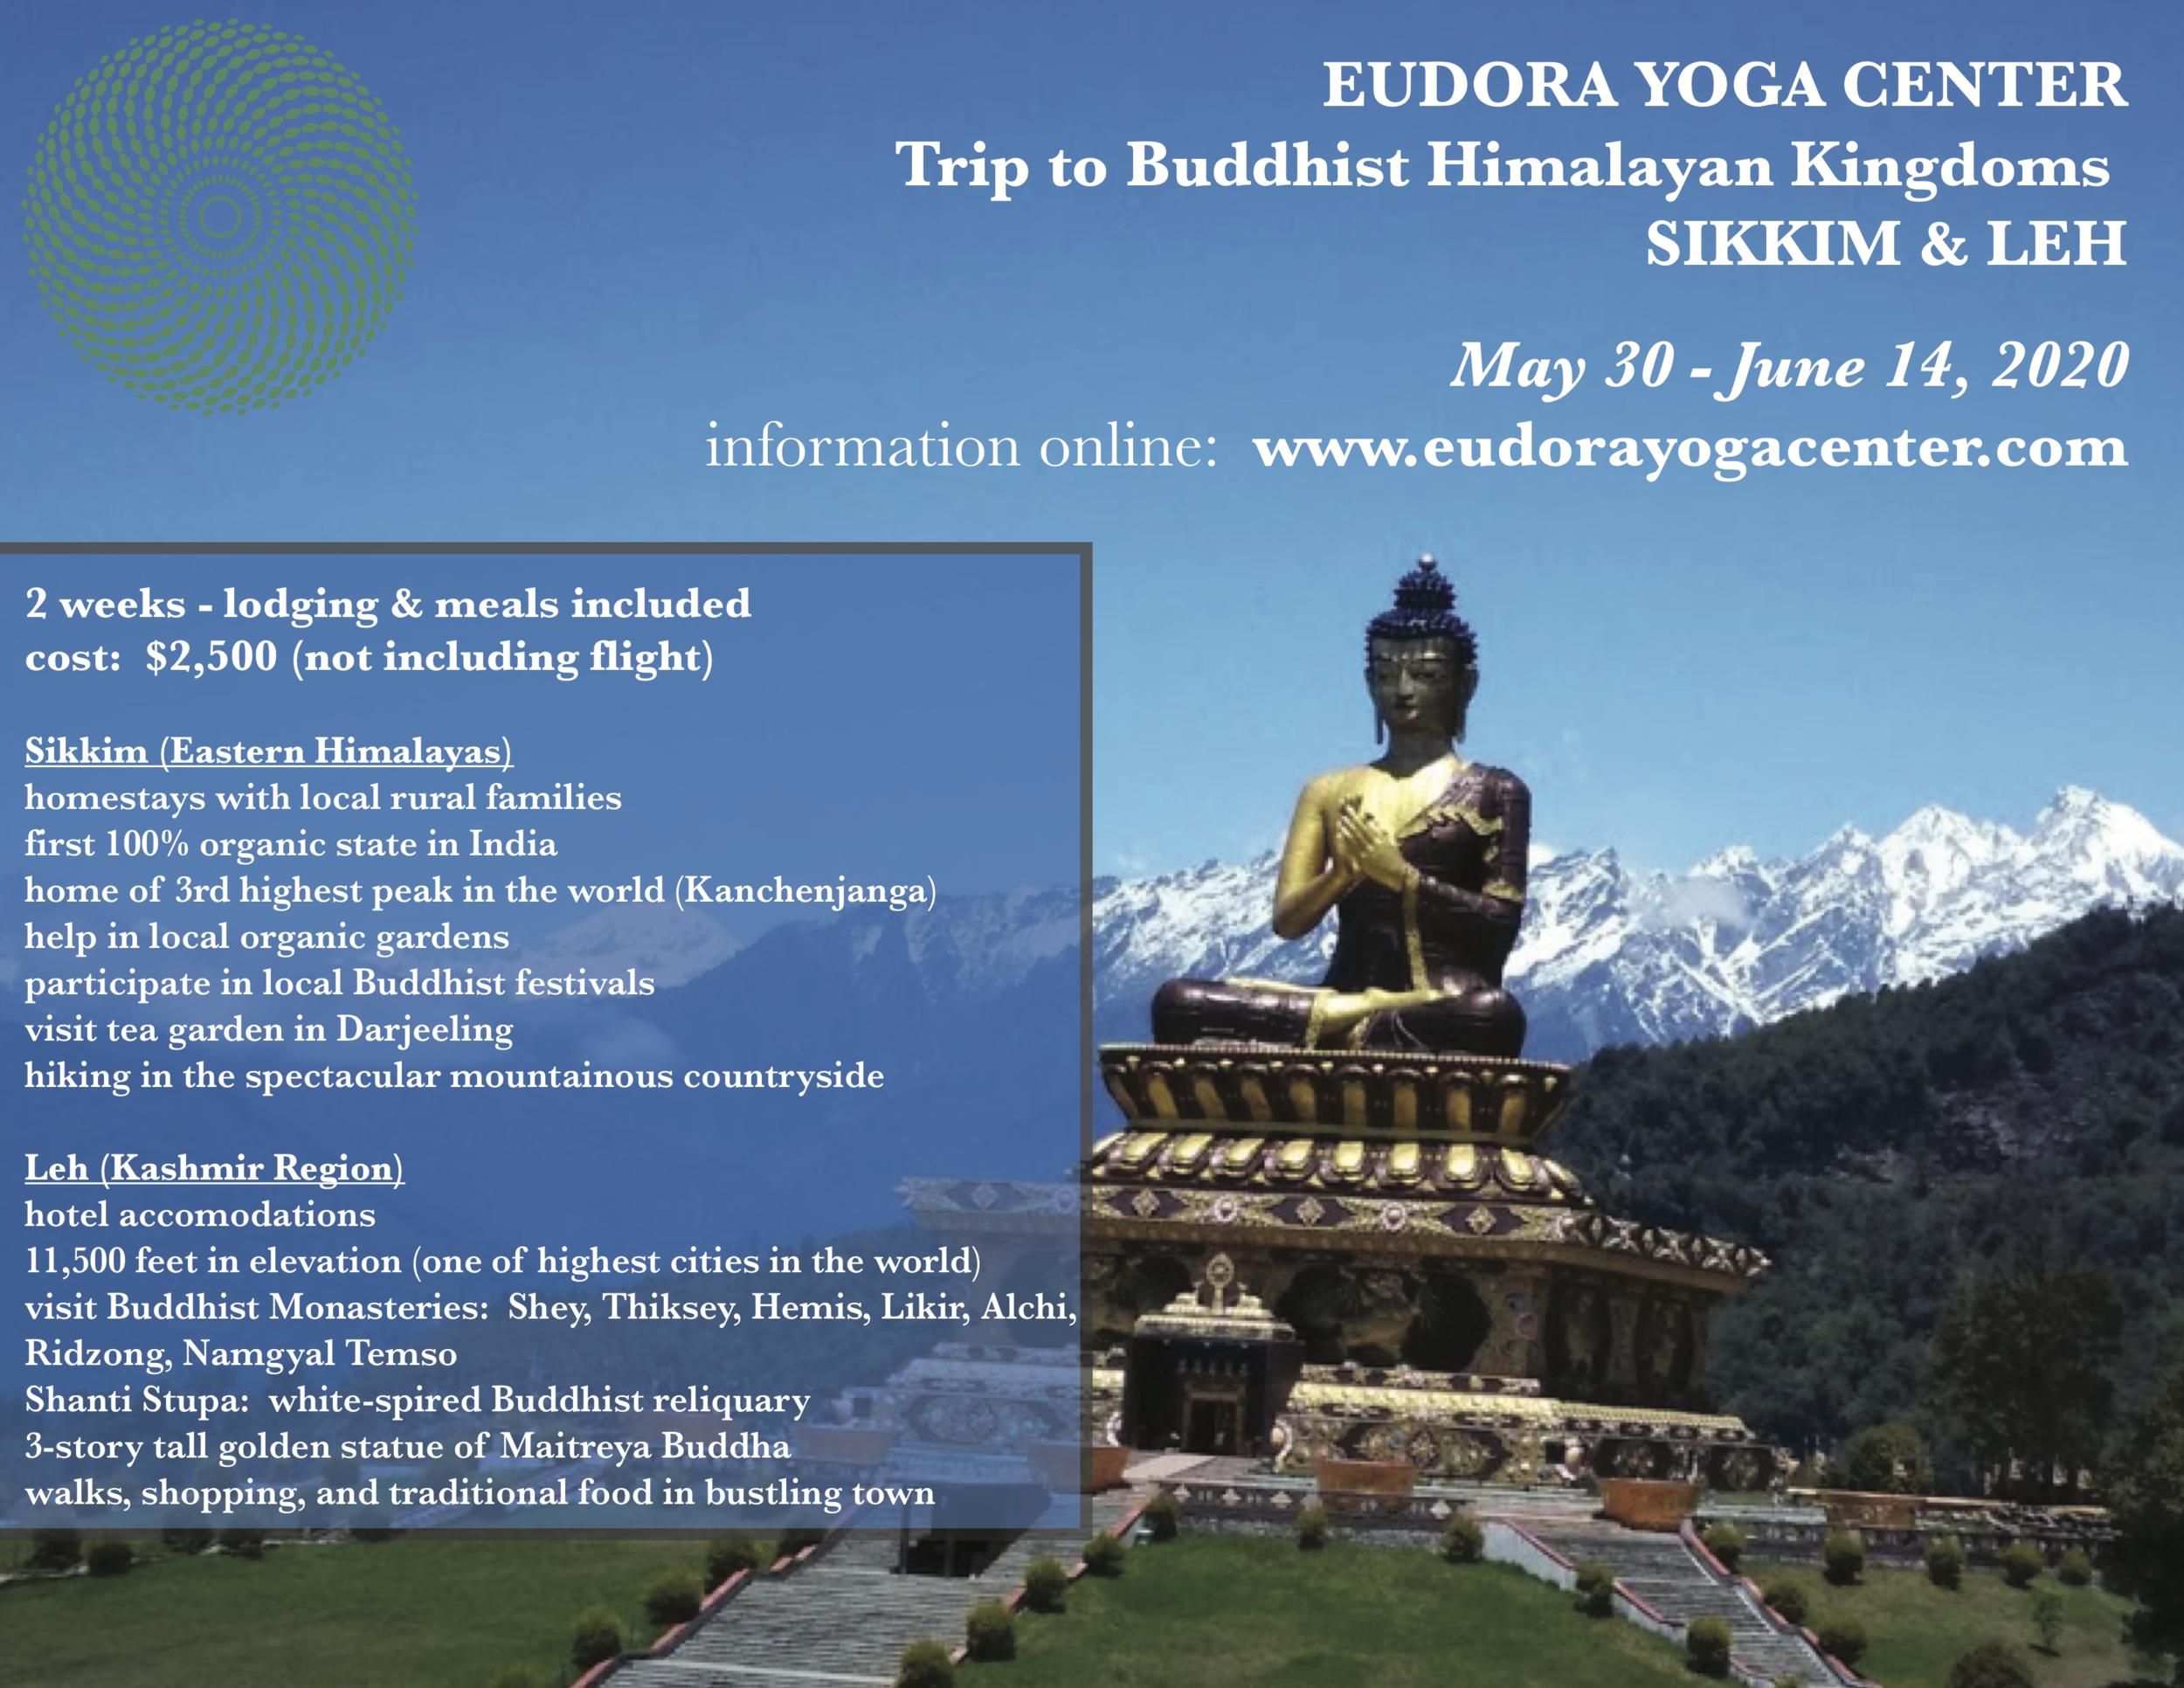 EYC TRIP TO BUDDHIST HIMALAYAN KINGDOMS